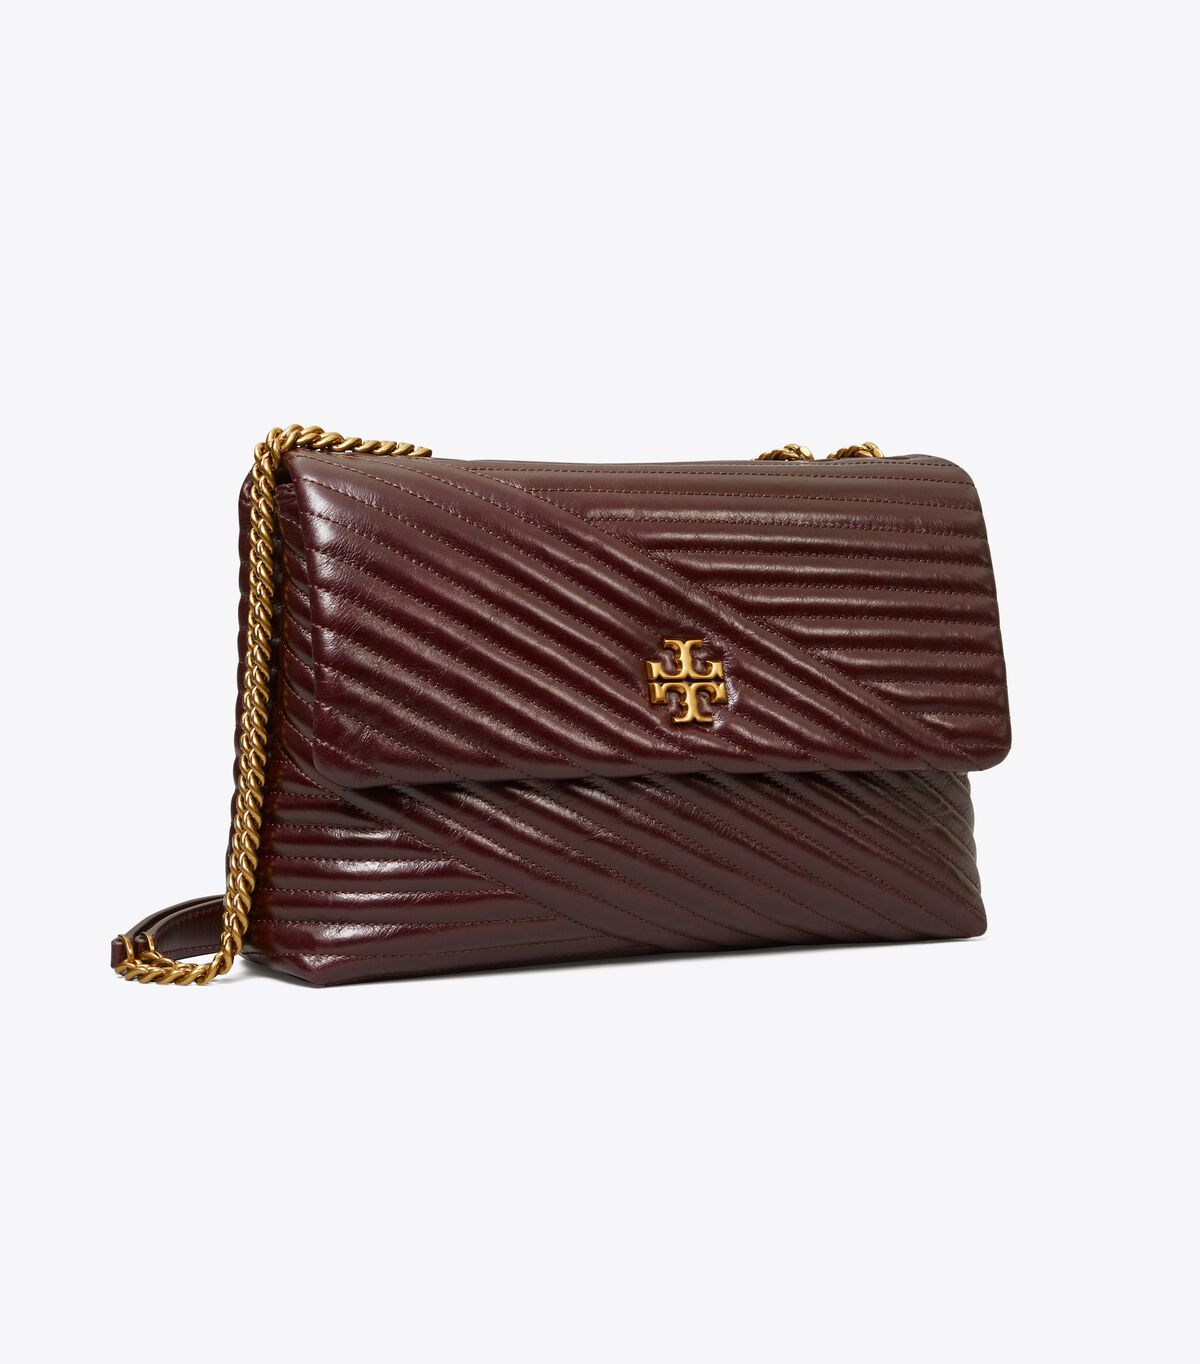 Kira Chevron Glazed Convertible Shoulder Bag